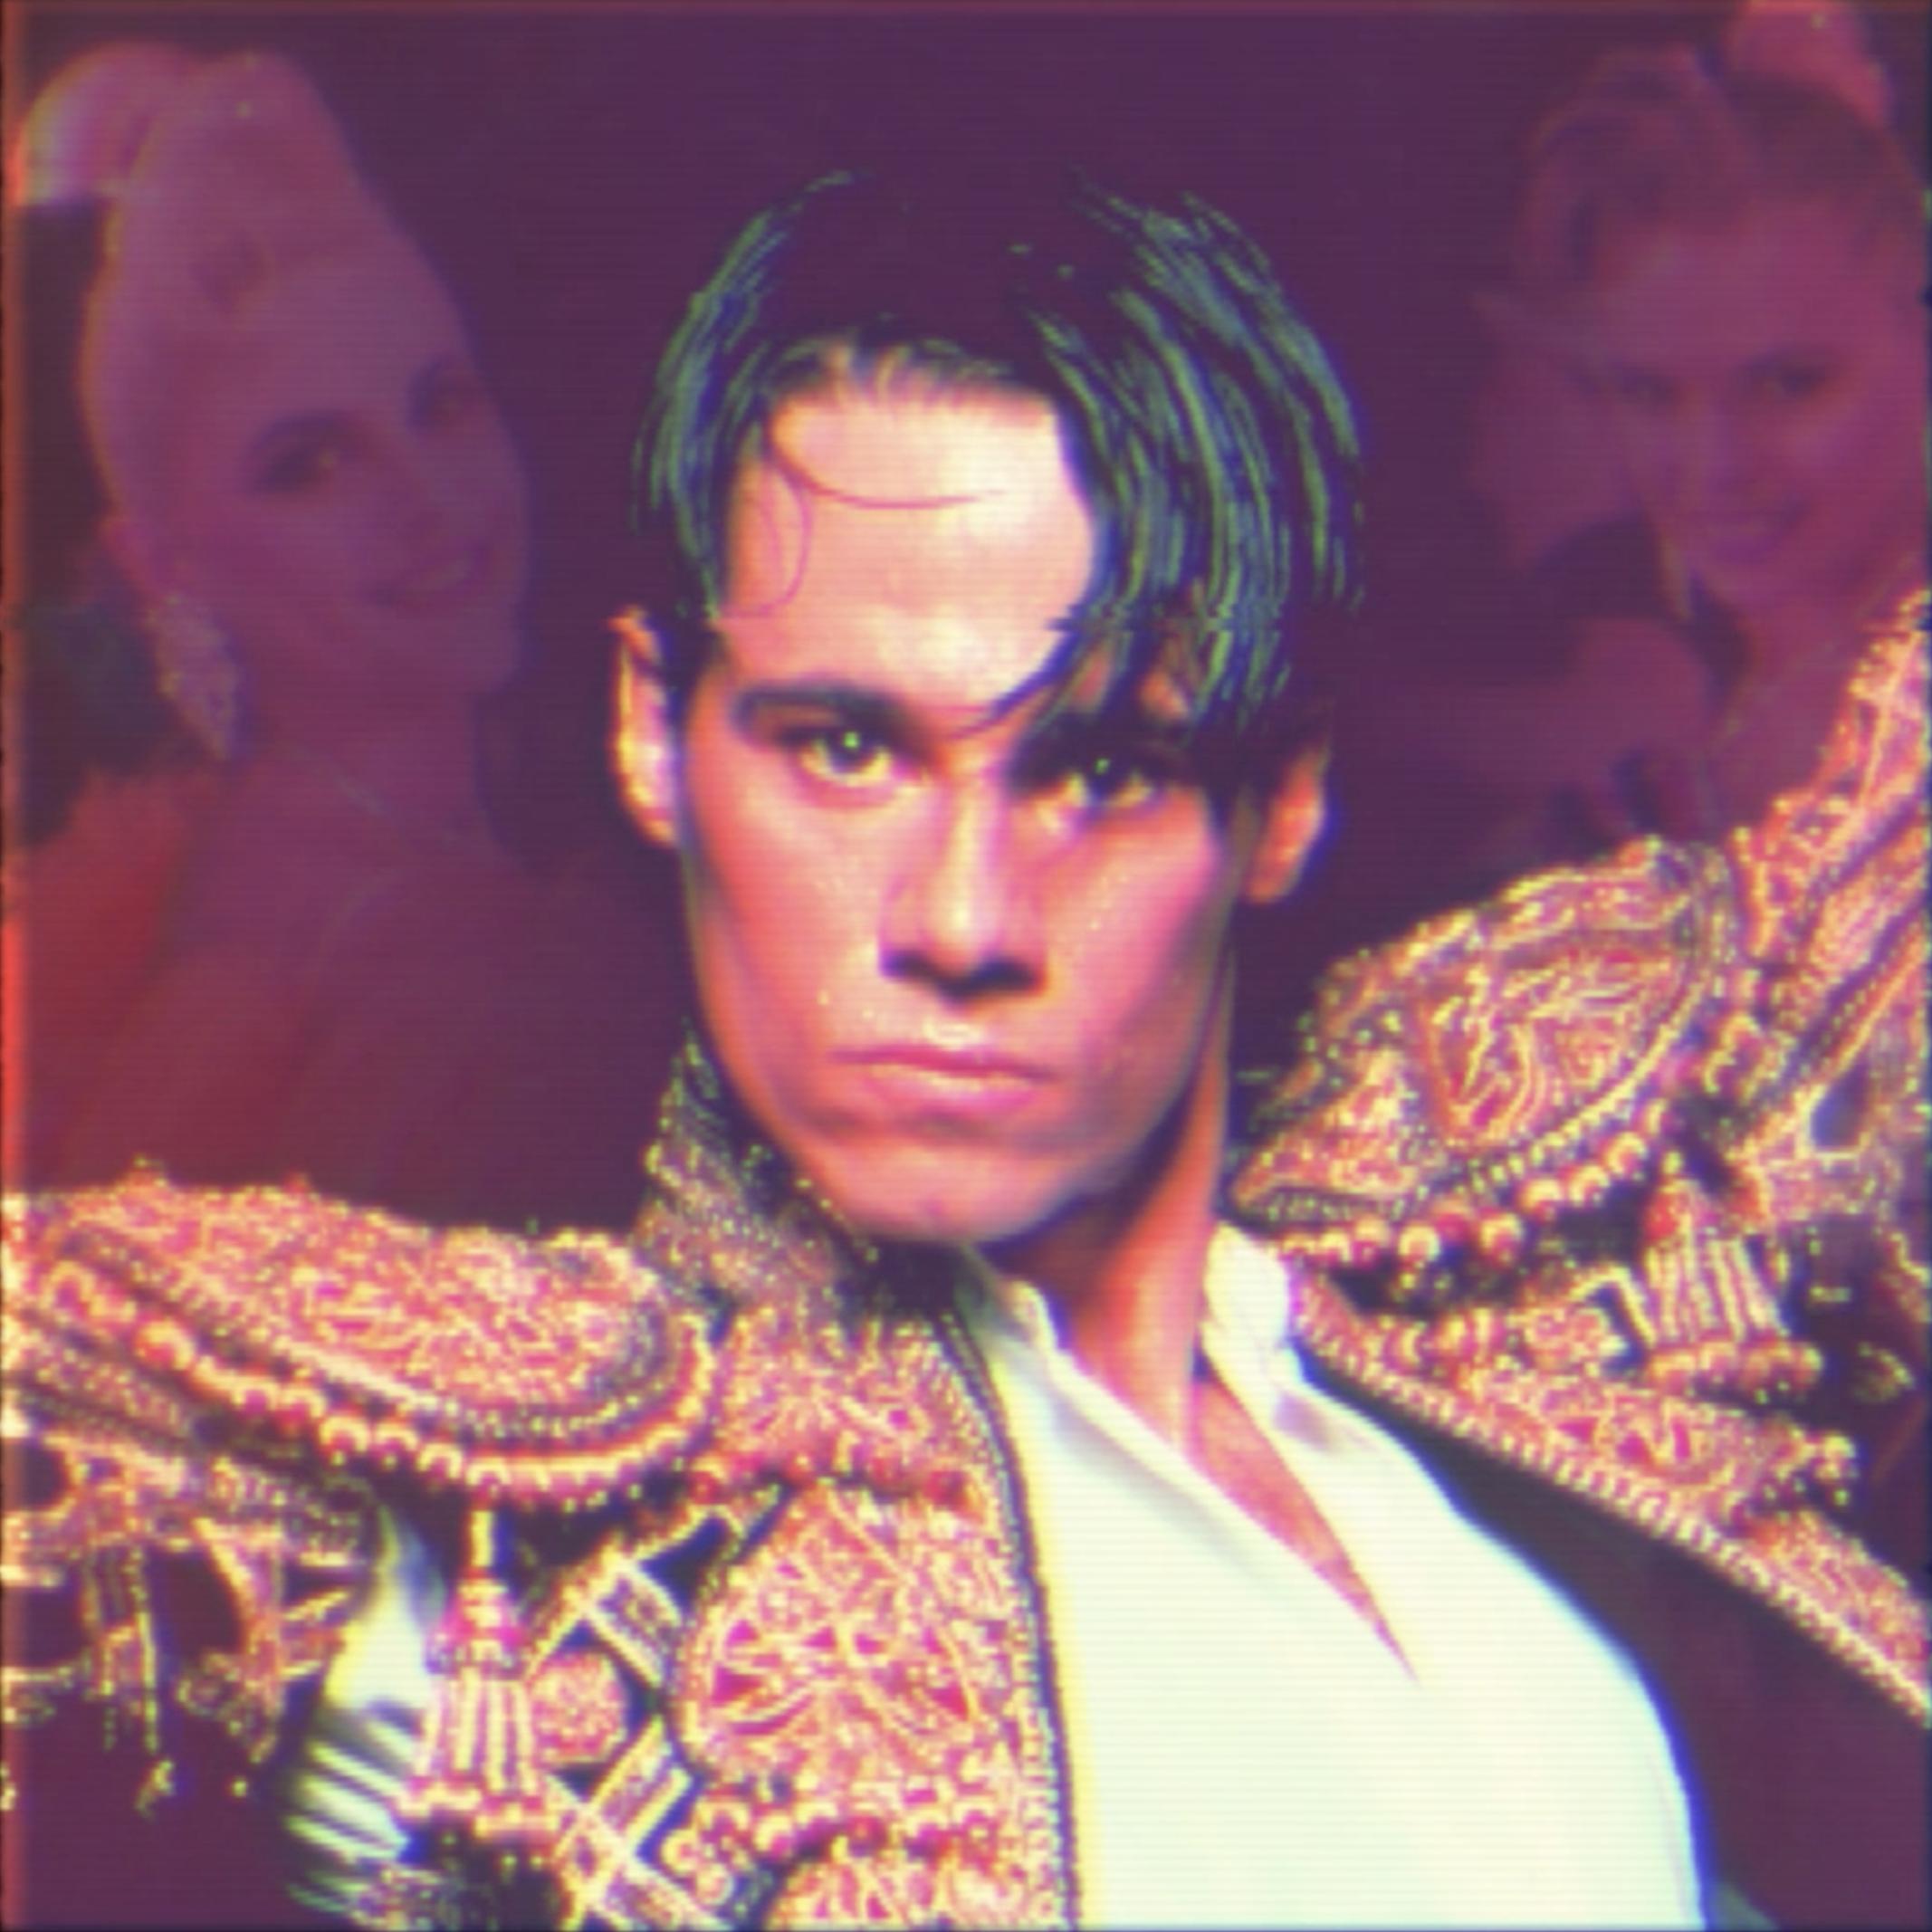 strictly-ballroom-paul-mercurio.png